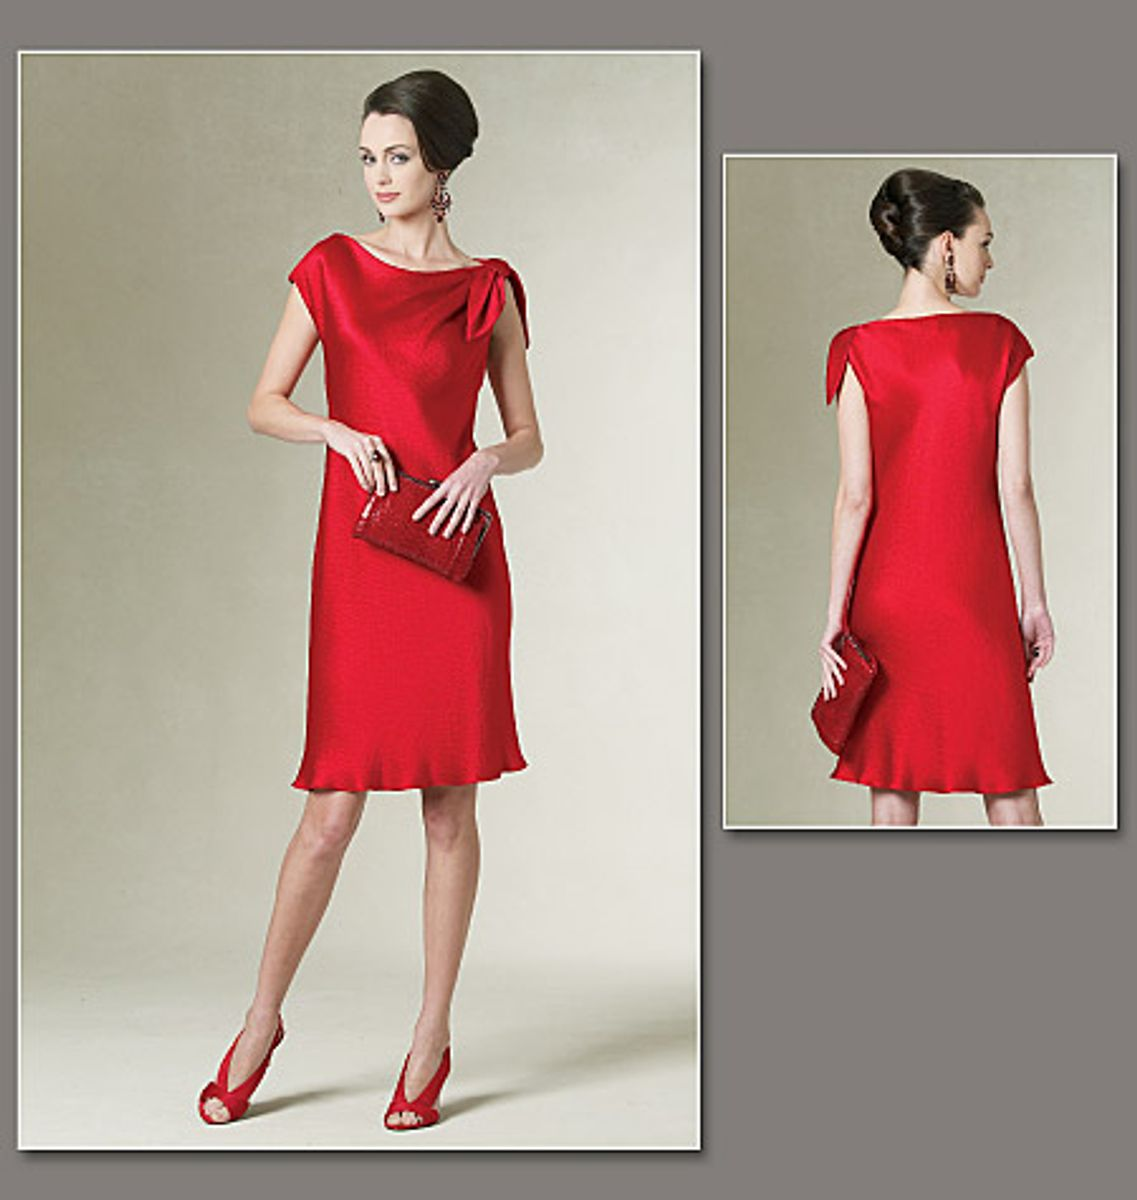 Patron de robe - Vogue 1208